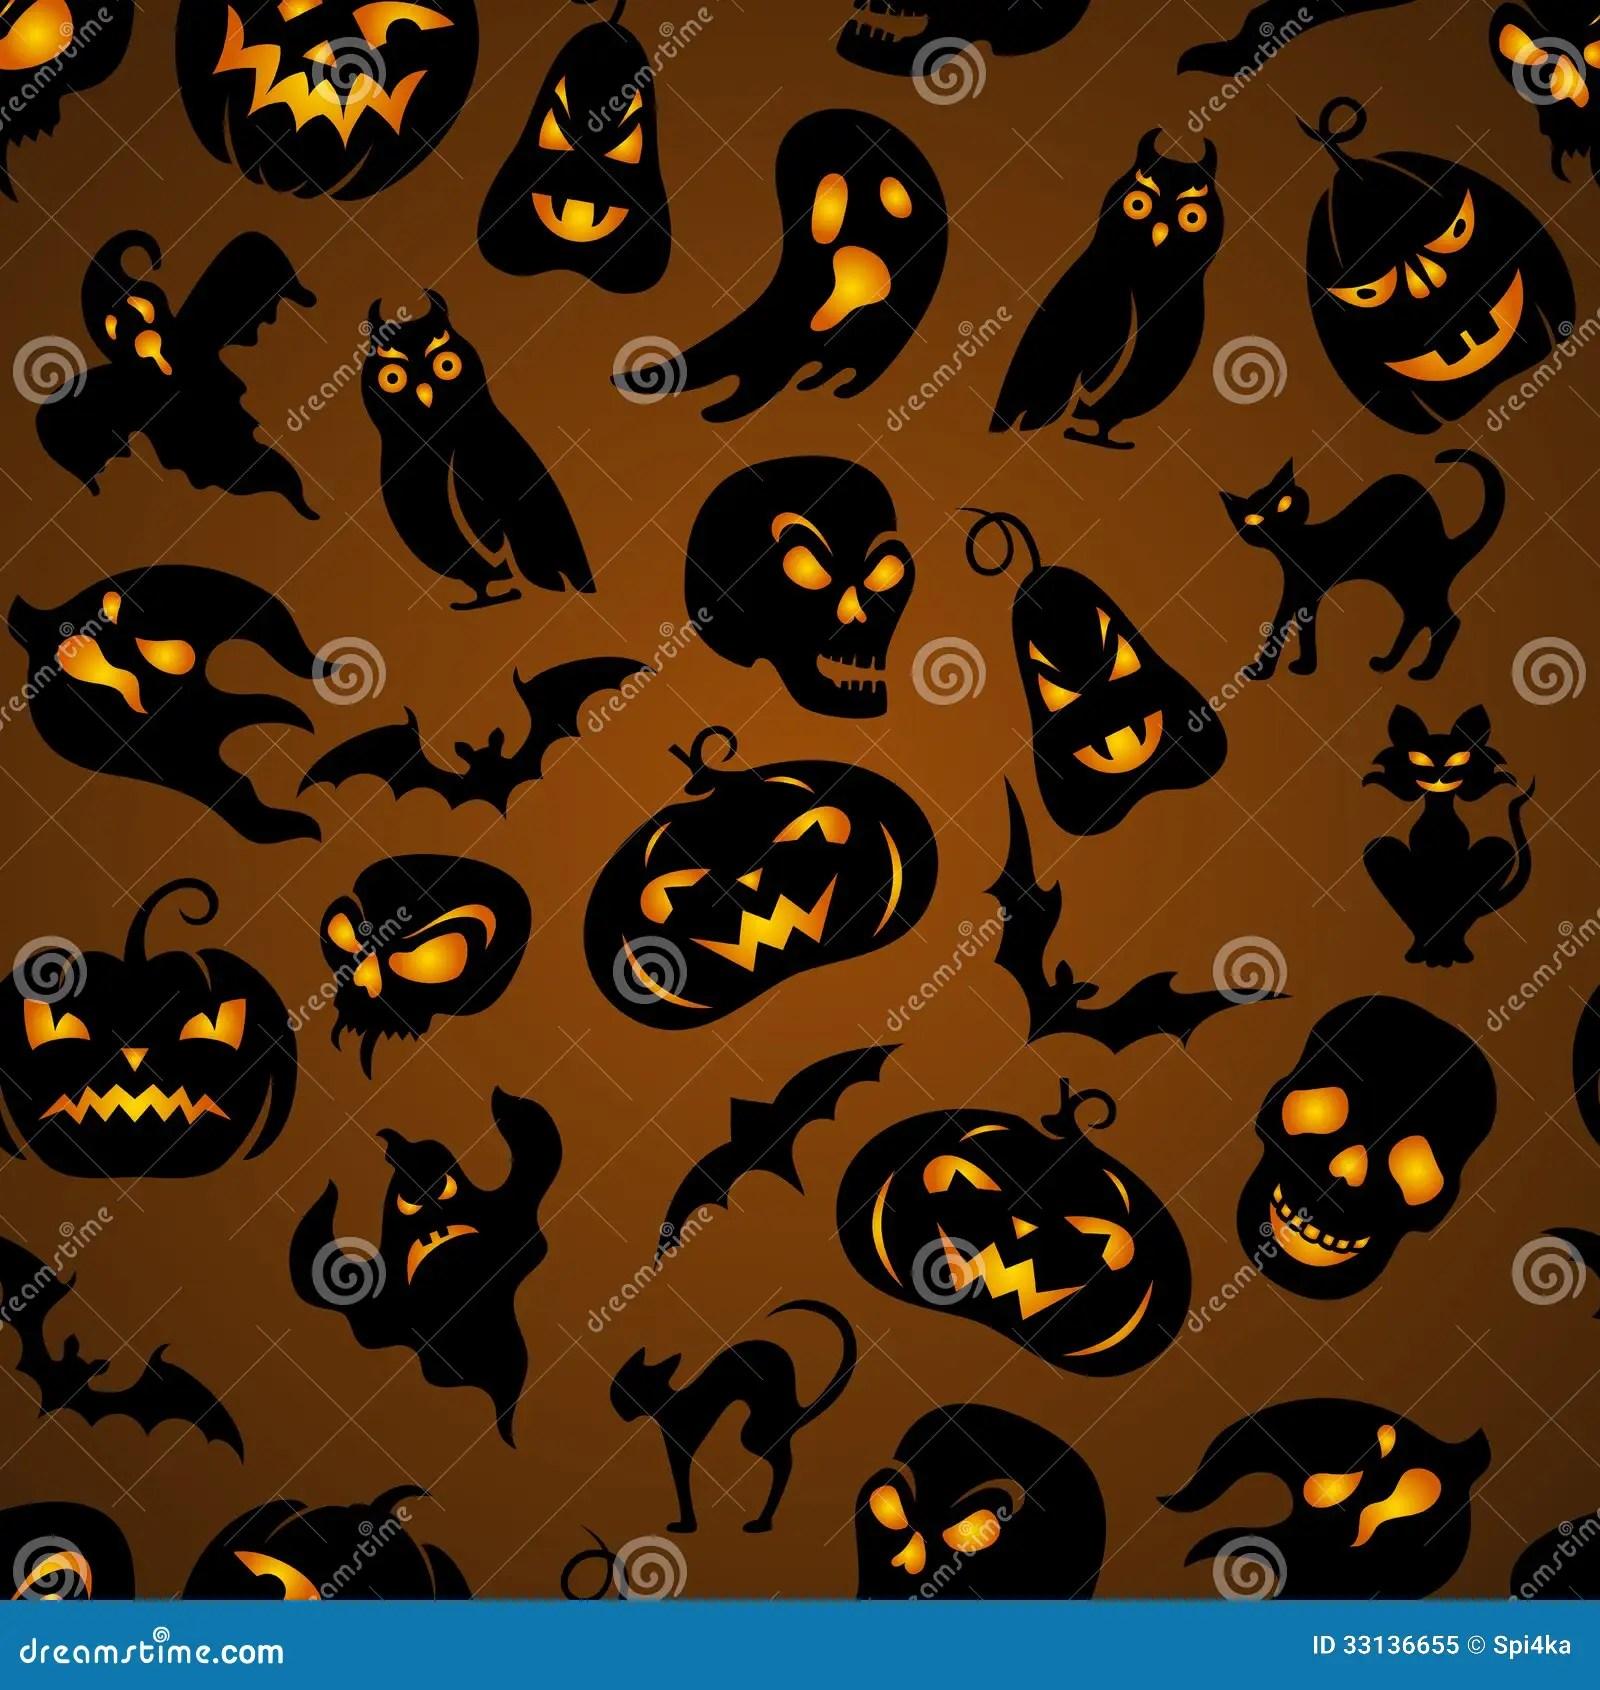 Fall Pumpkin Wallpaper Halloween Seamless Pattern Stock Vector Image Of Drawn